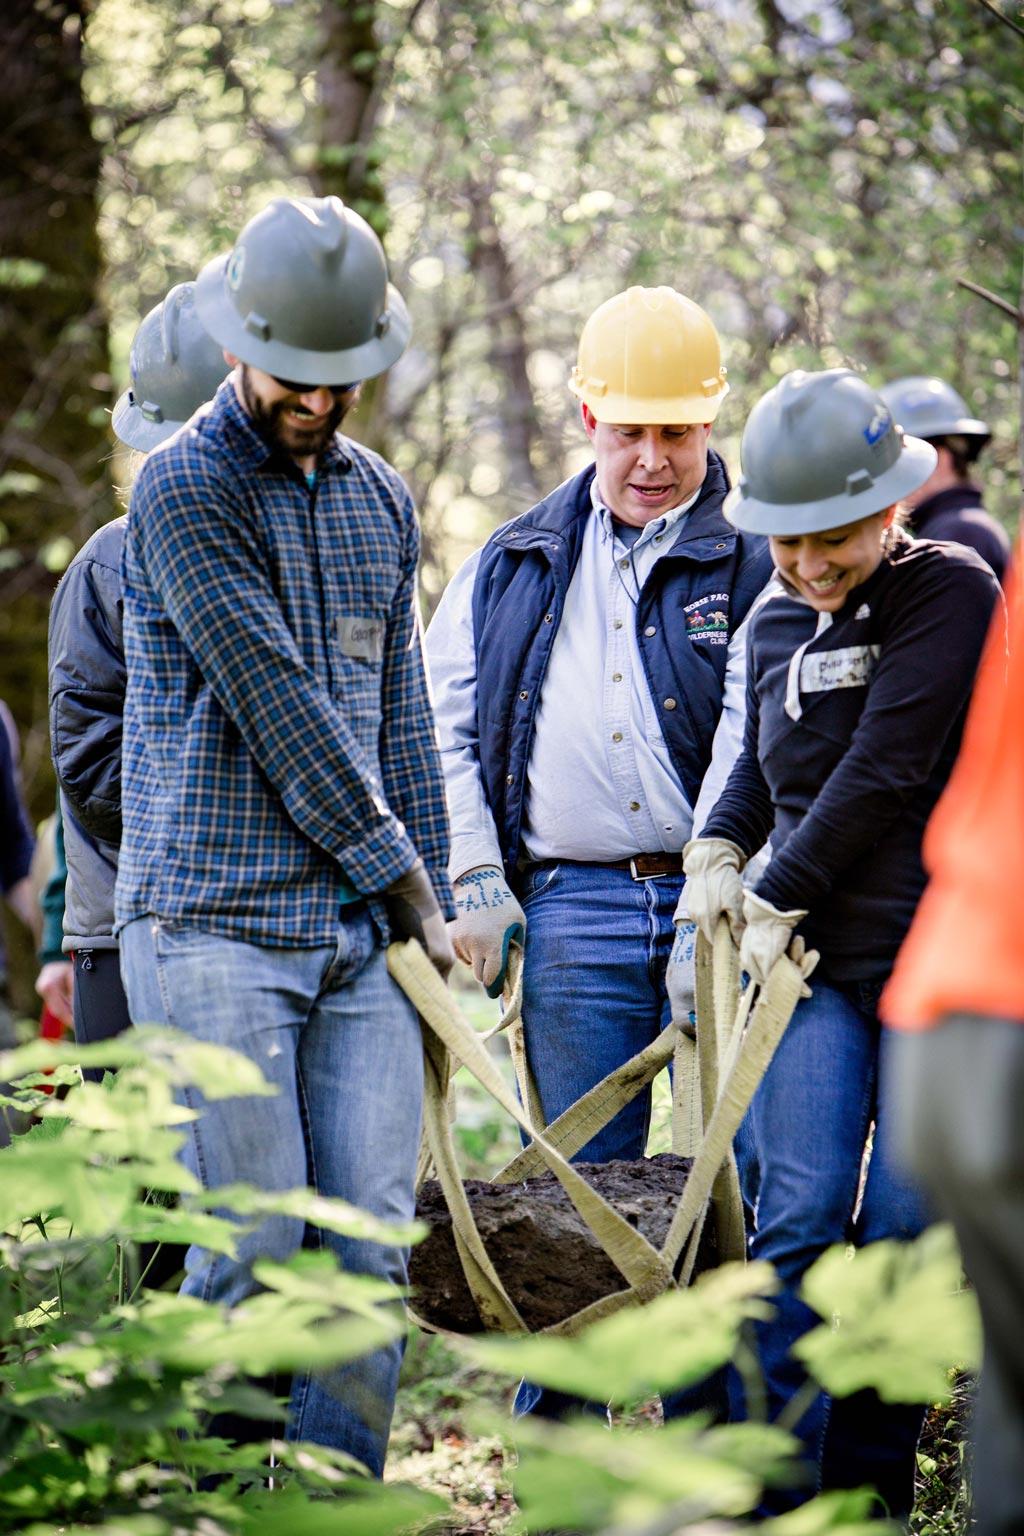 trail-maintenance-volunteer-pacific-crest-trail-Shonda-Feather